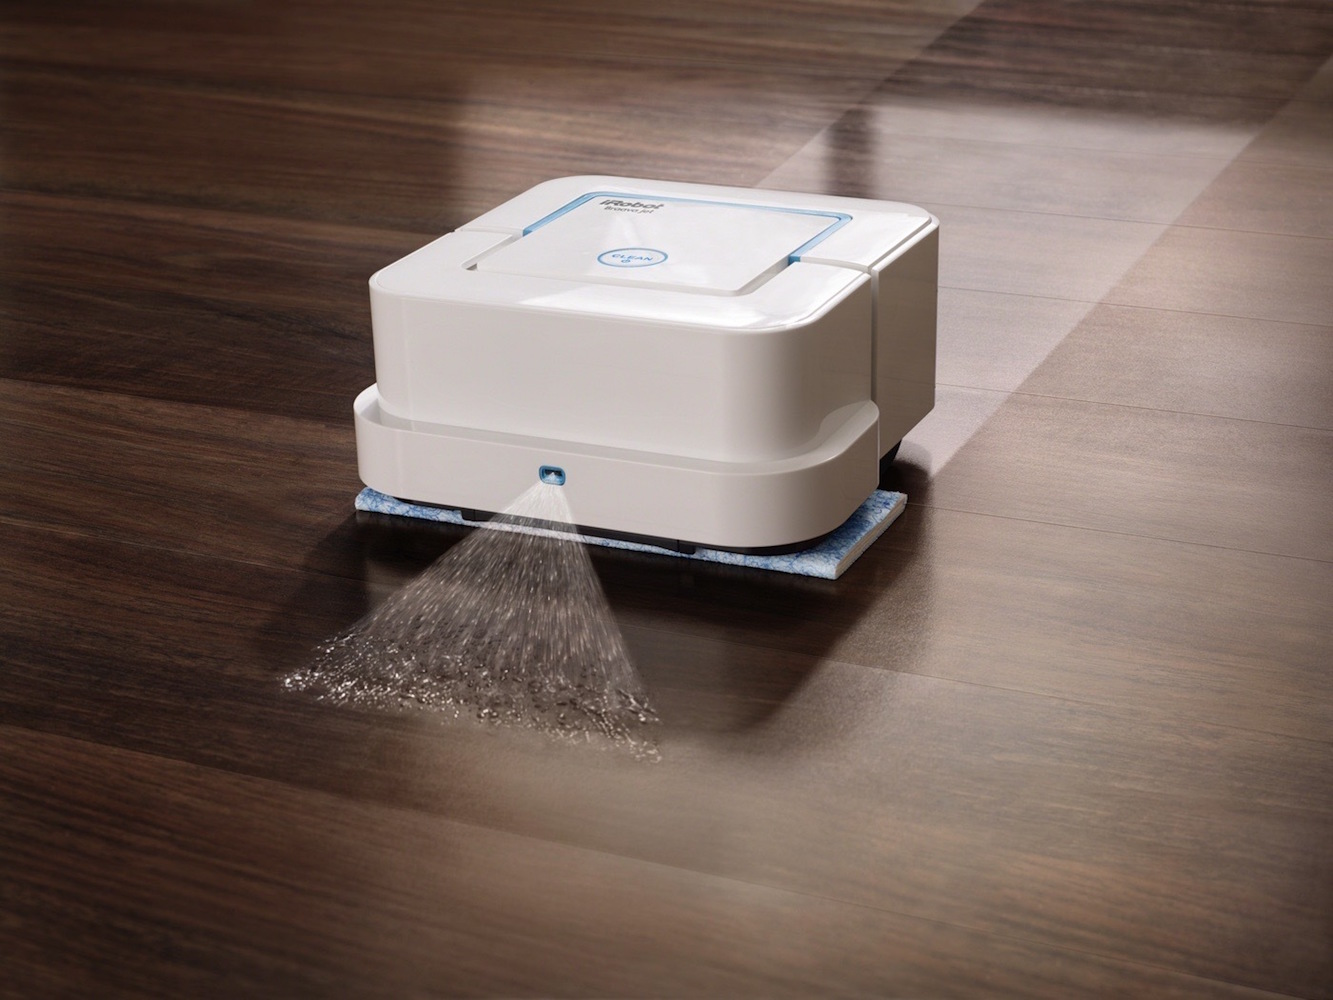 Braava Jet Robotic Mop by iRobot